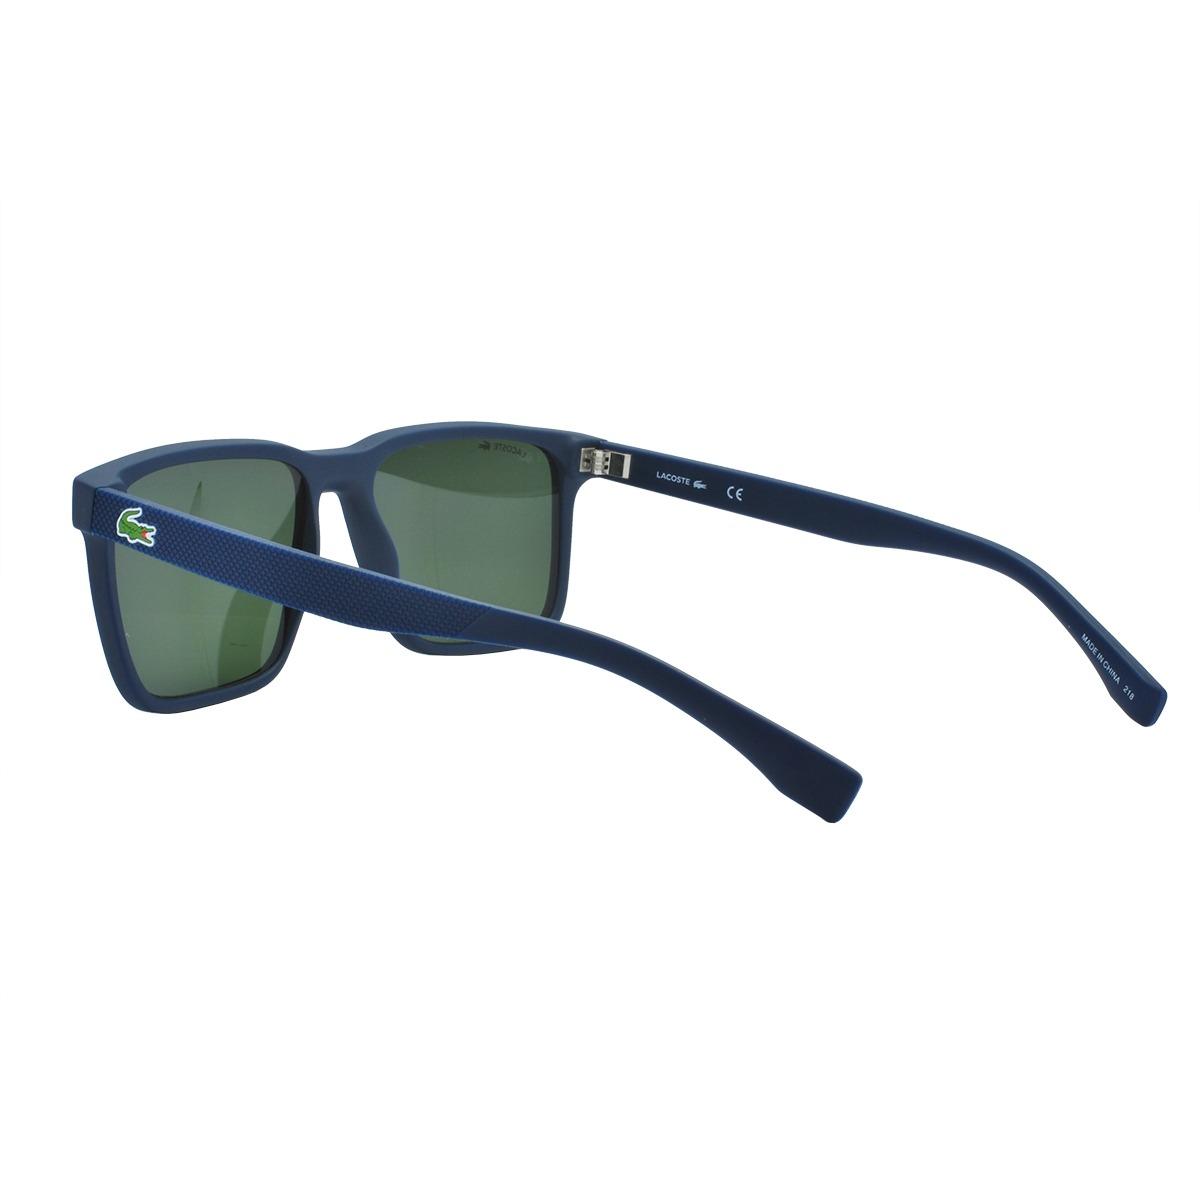 664b69bb2e922 óculos de sol lacoste original masculino l872s 421. Carregando zoom.